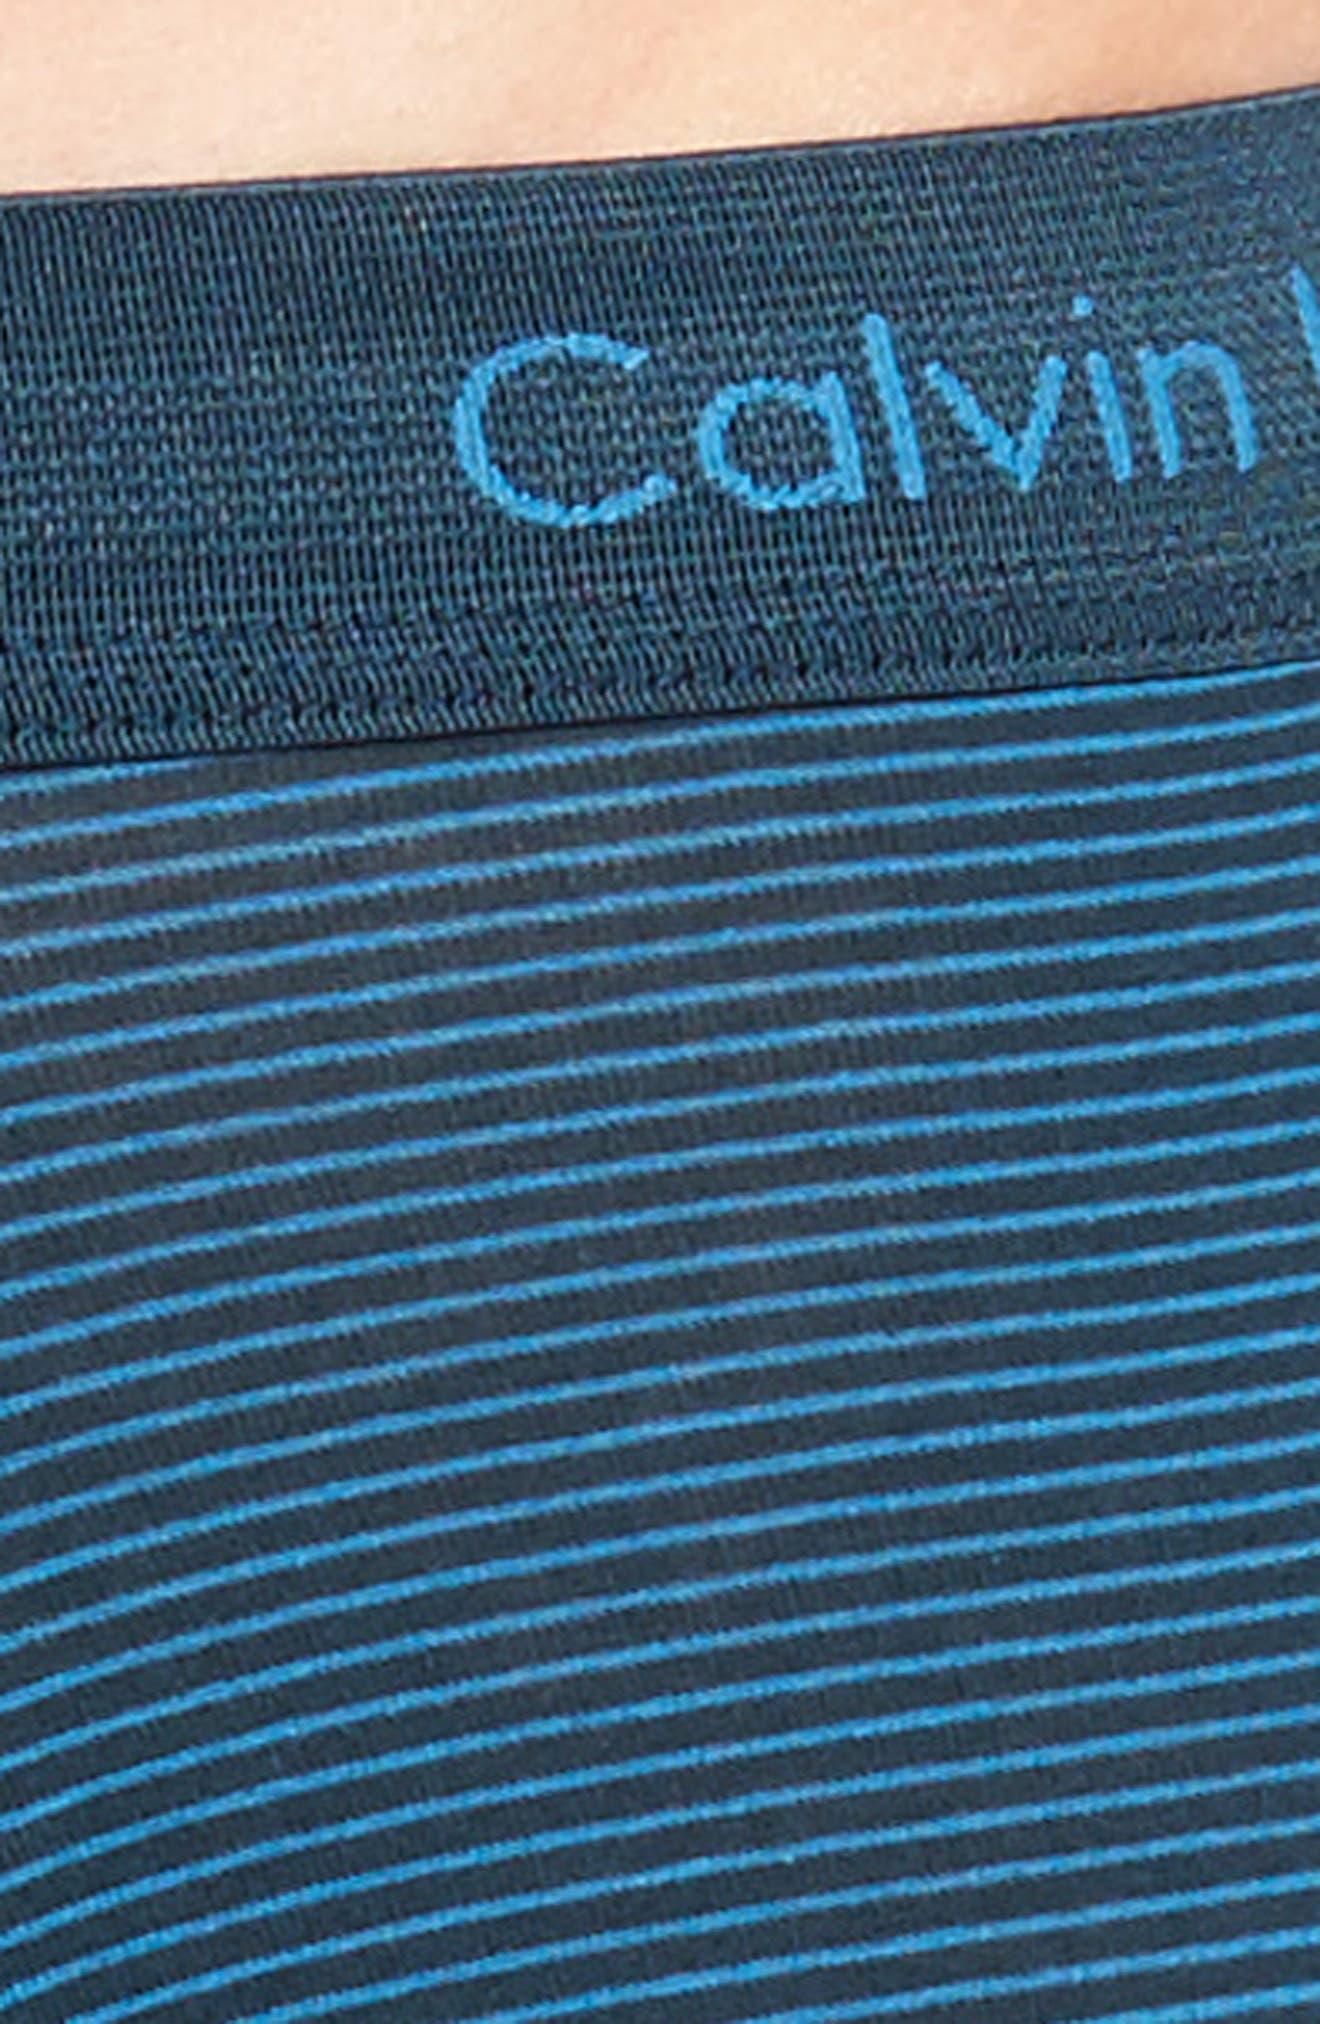 3-Pack Stretch Cotton Low Rise Trunks,                             Alternate thumbnail 5, color,                             BLUE/ SPELLBOUND/ FERVENT